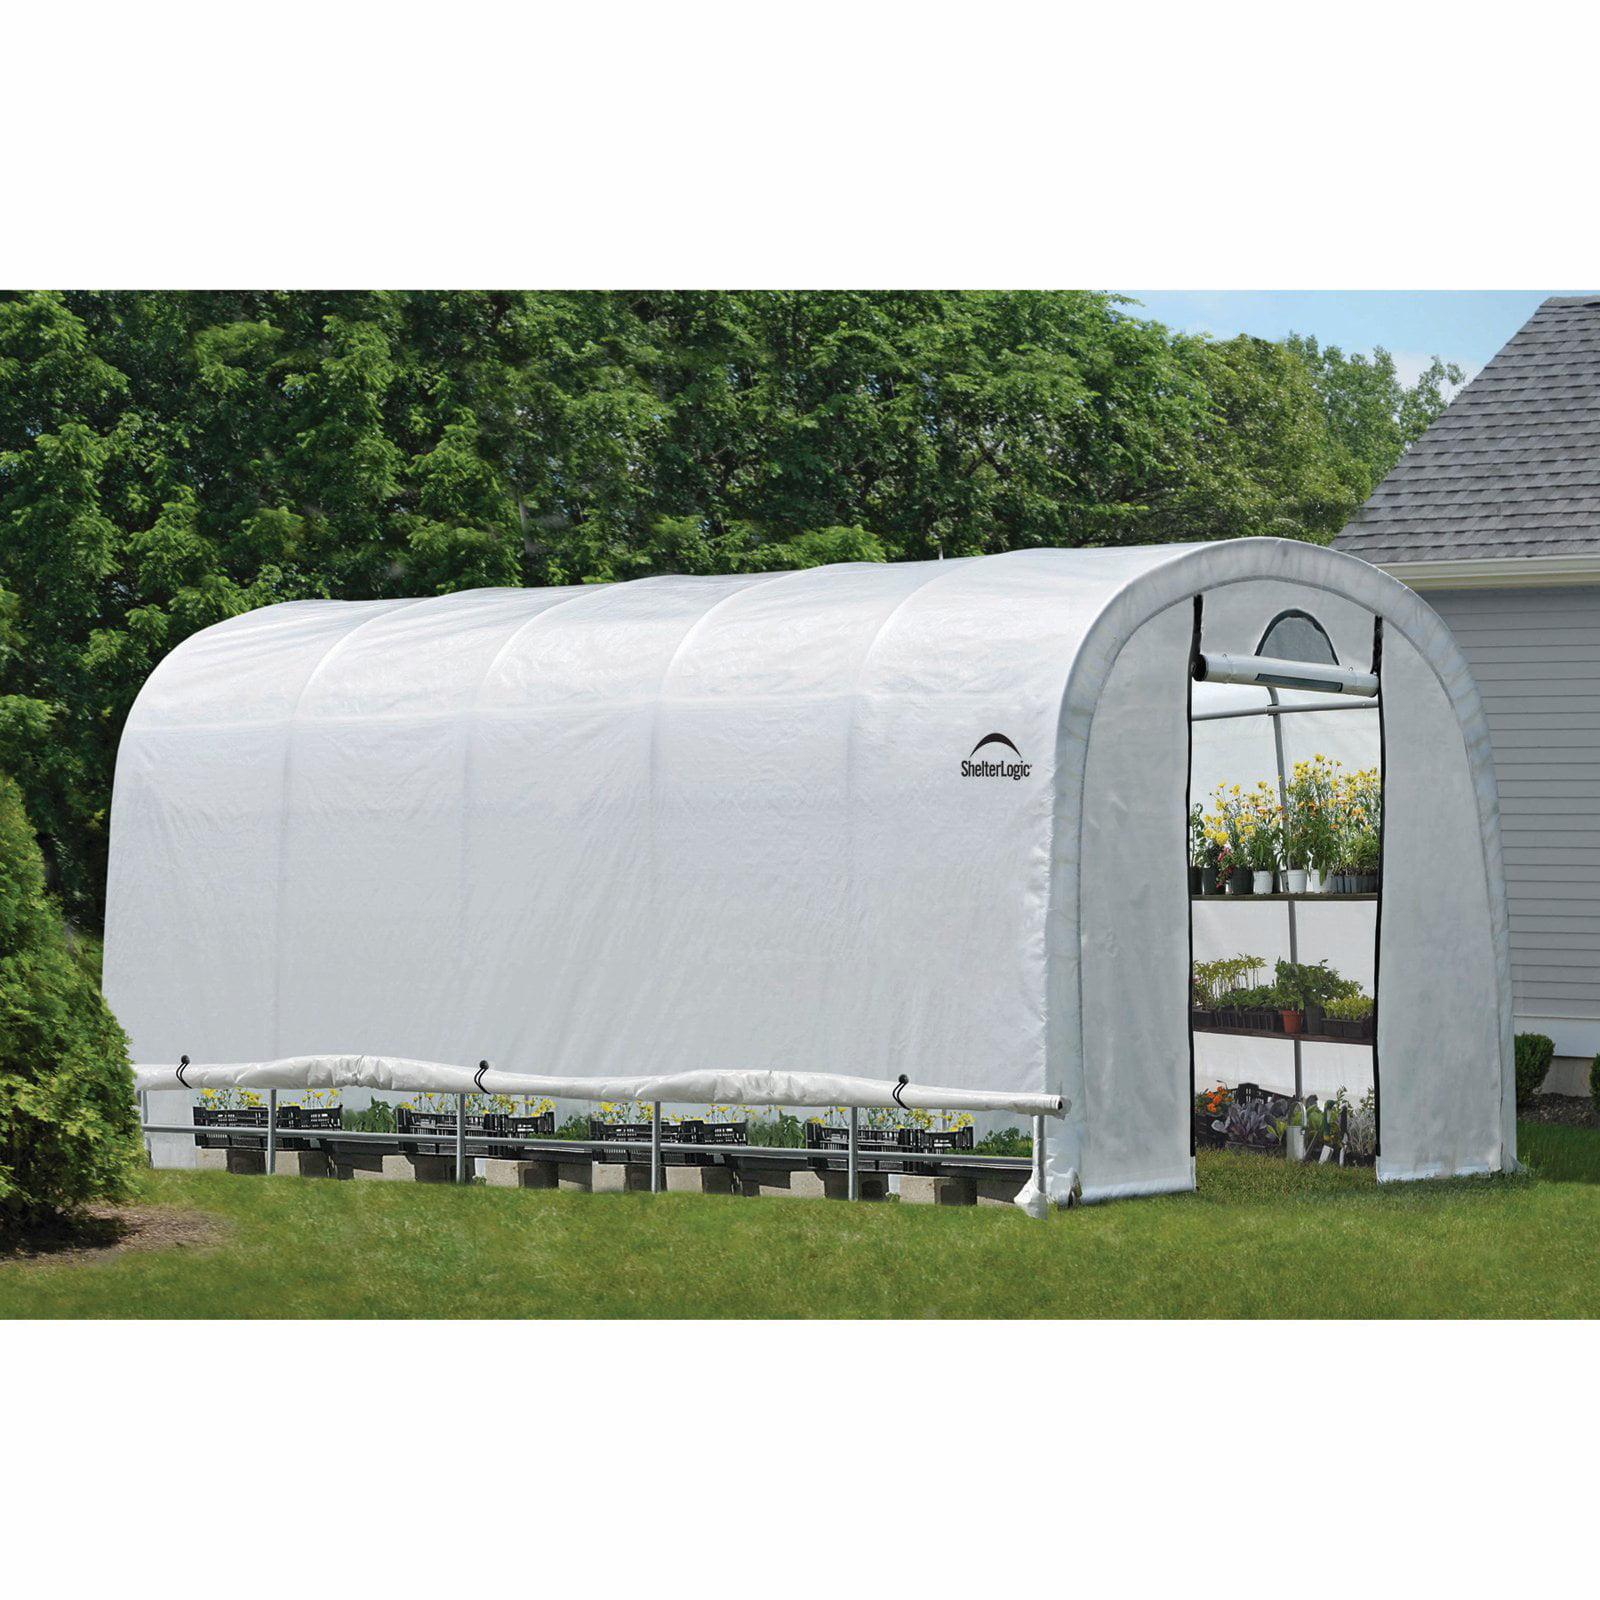 GrowIt Heavy Duty Walk-Thru Greenhouse Round-Style, 12' x 20' x 8' by ShelterLogic